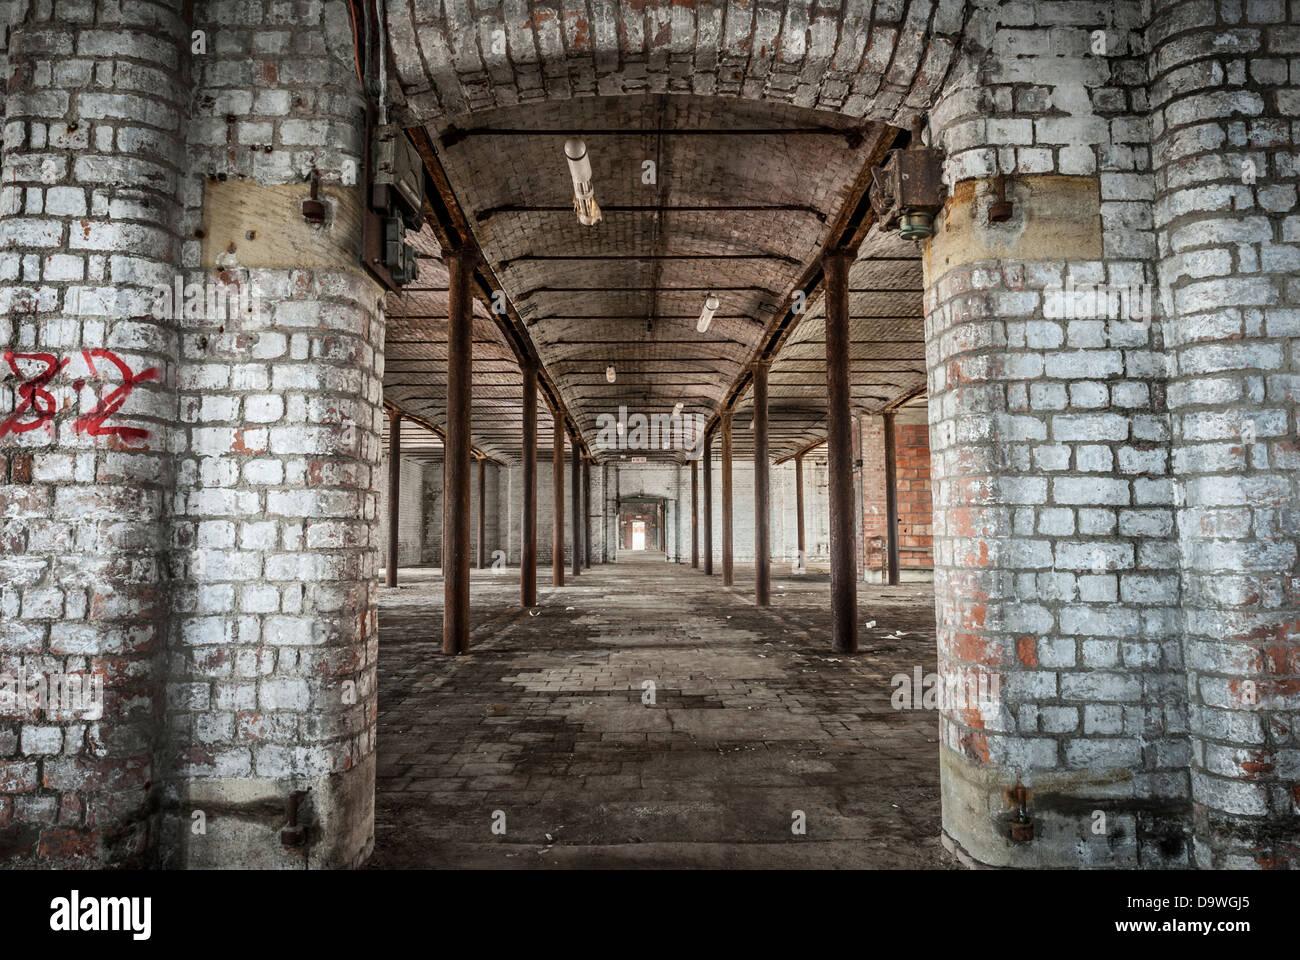 Abandoned Victorian Warehouse Interior With Rusting Iron Pillars.